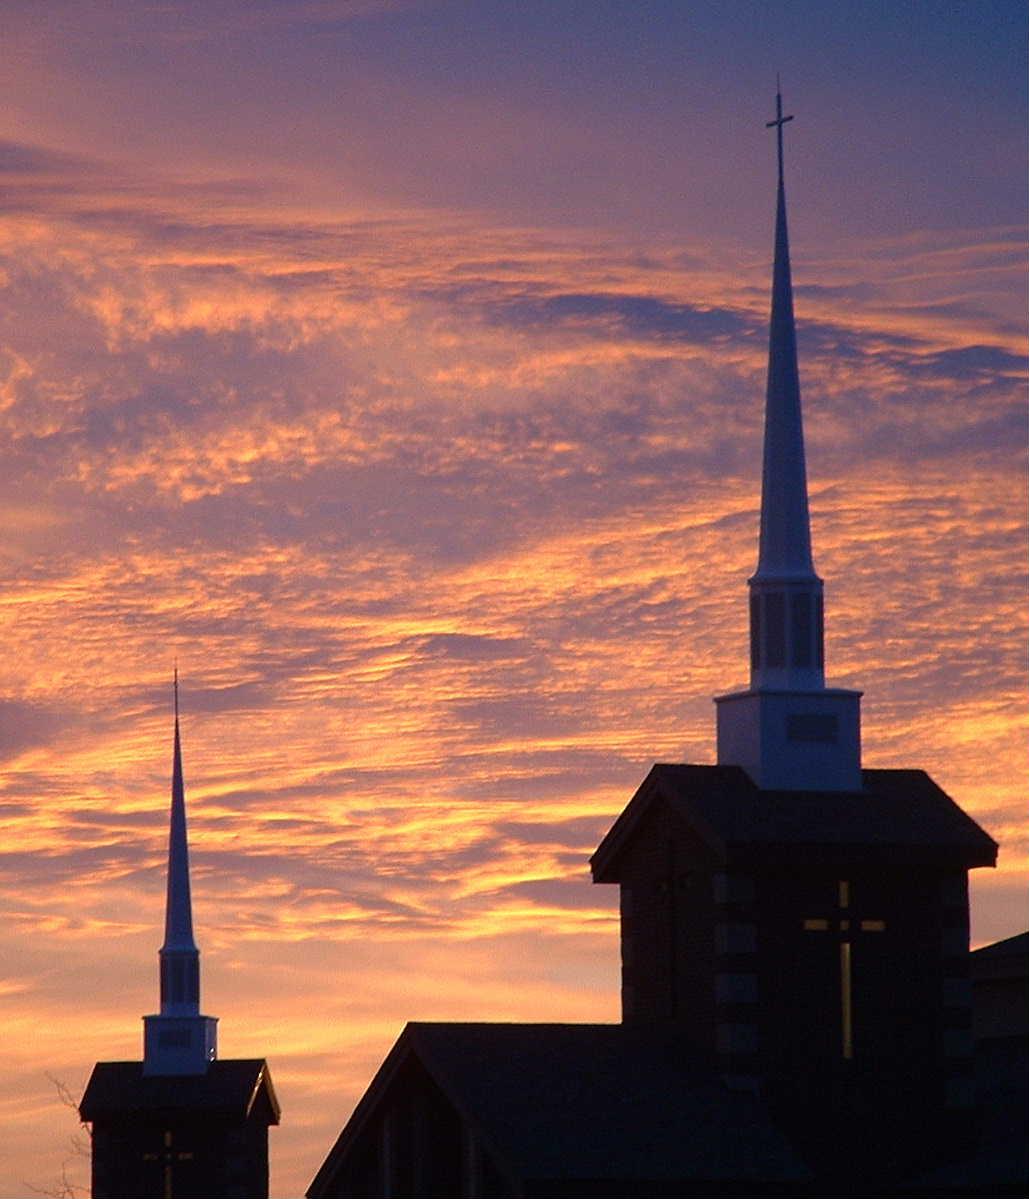 steeples at dusk 02a.JPG